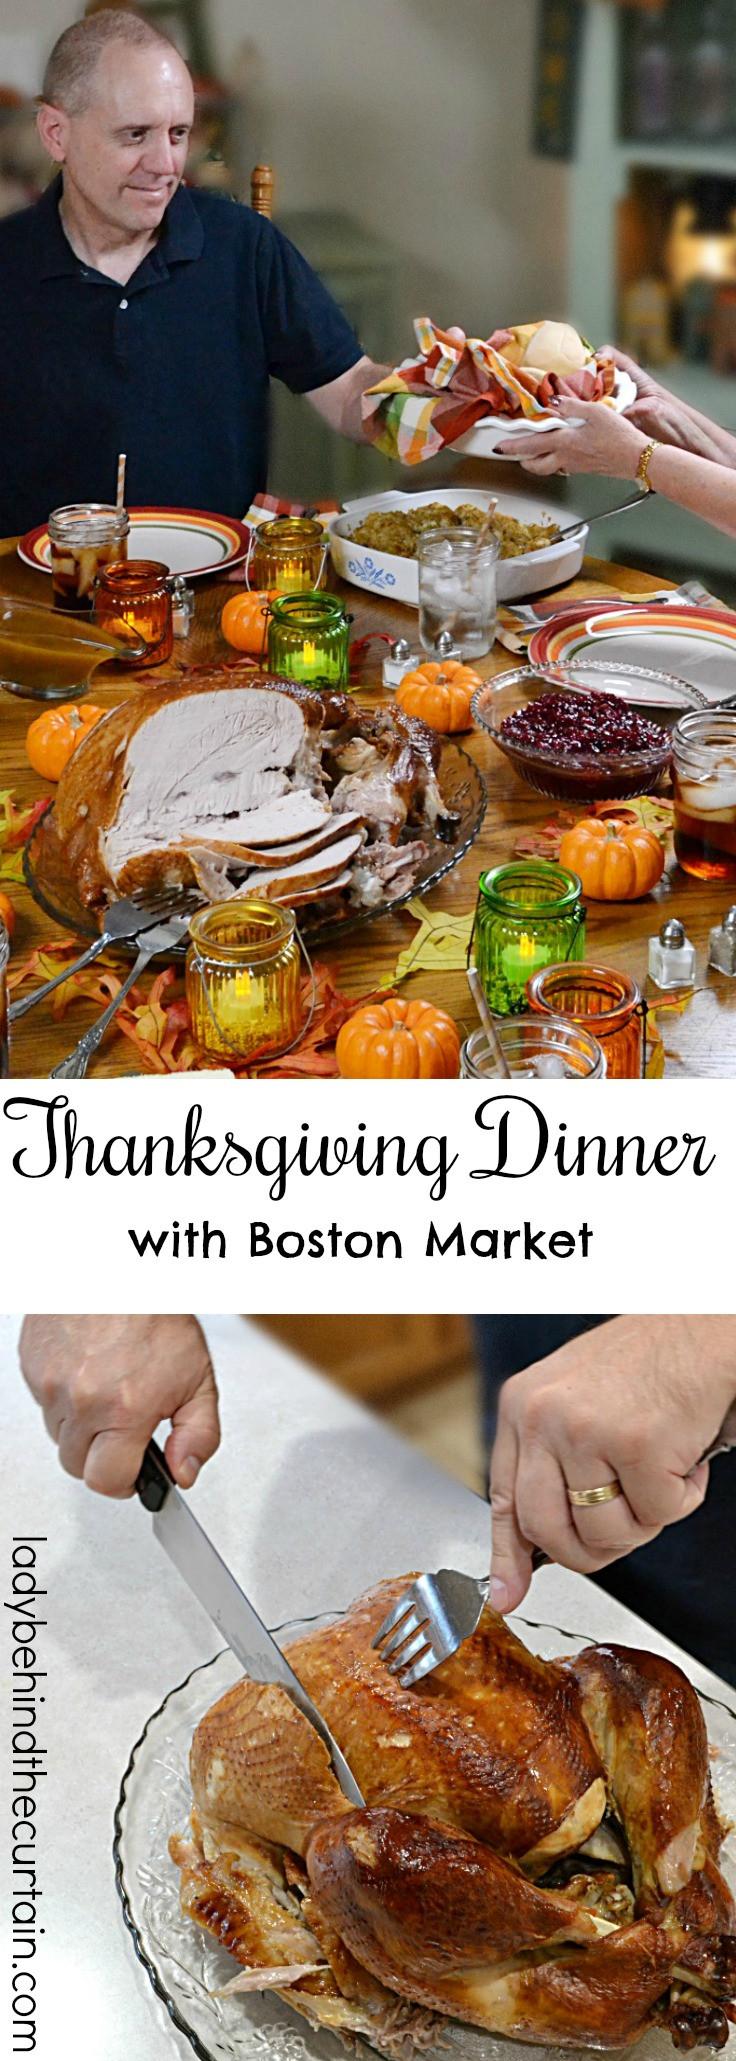 Boston Market Thanksgiving Turkey Dinner  Thanksgiving Dinner with Boston Market